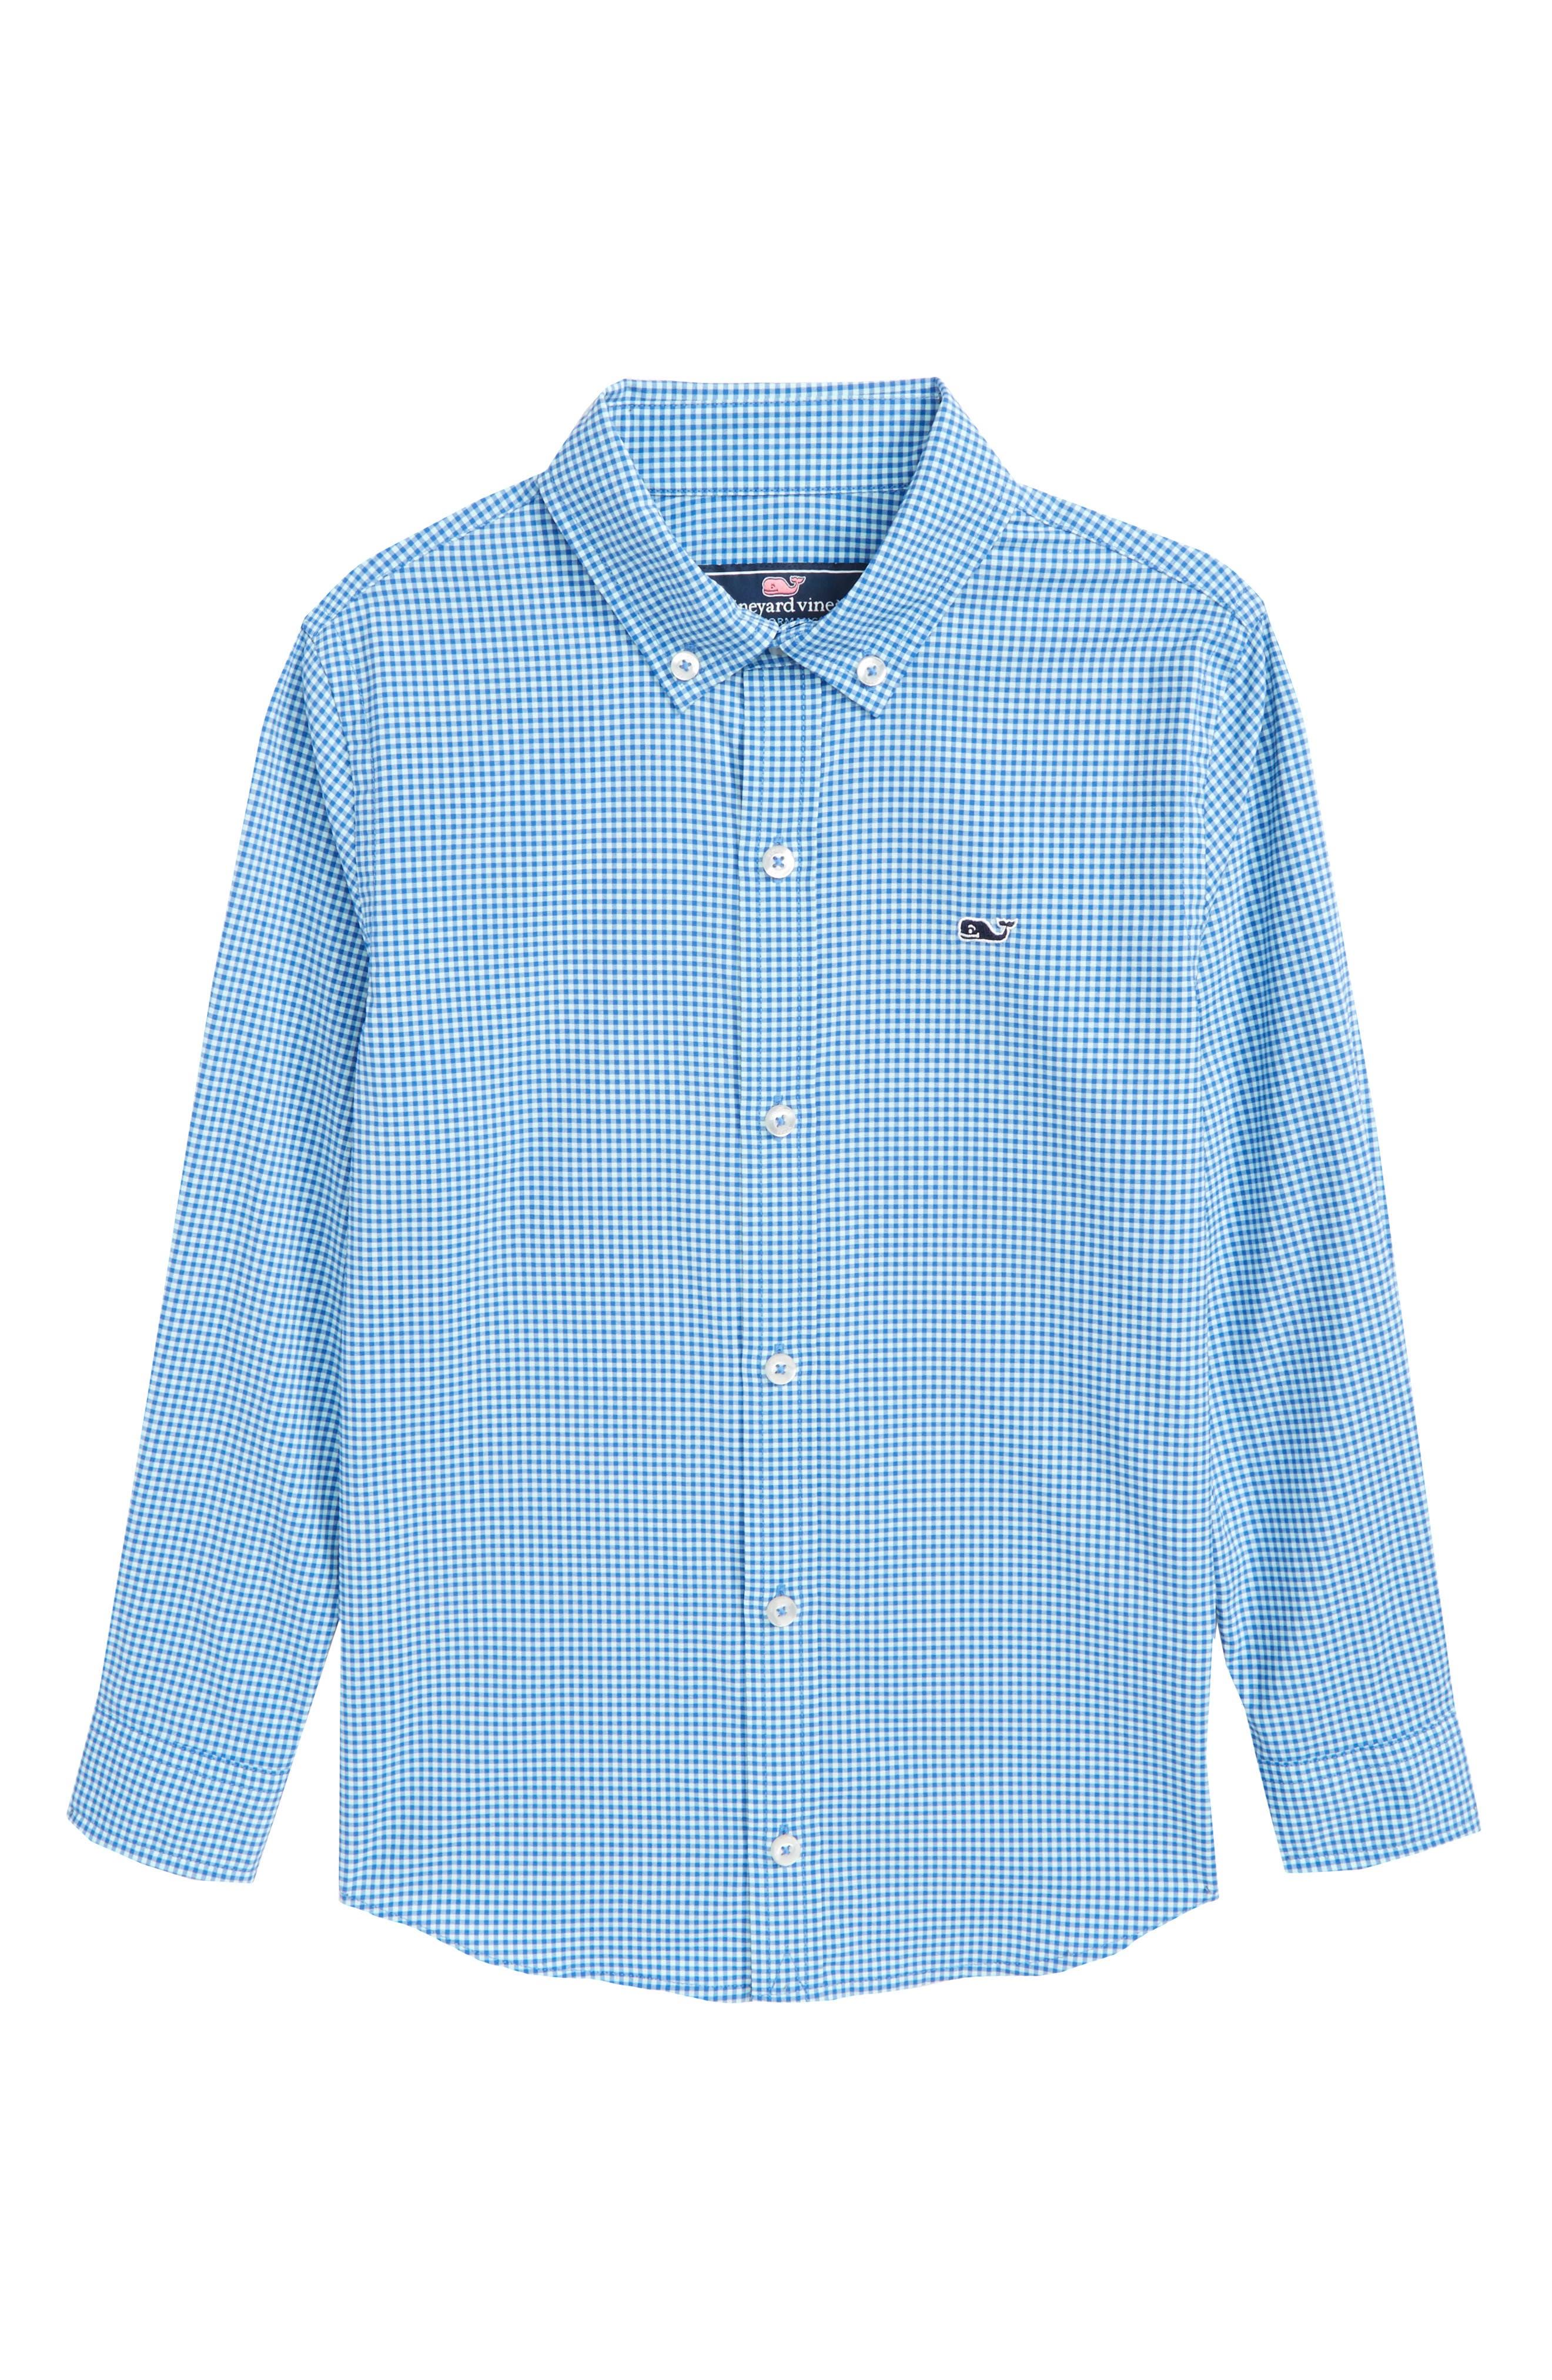 Marina Gingham Check Whale Shirt,                         Main,                         color, 451